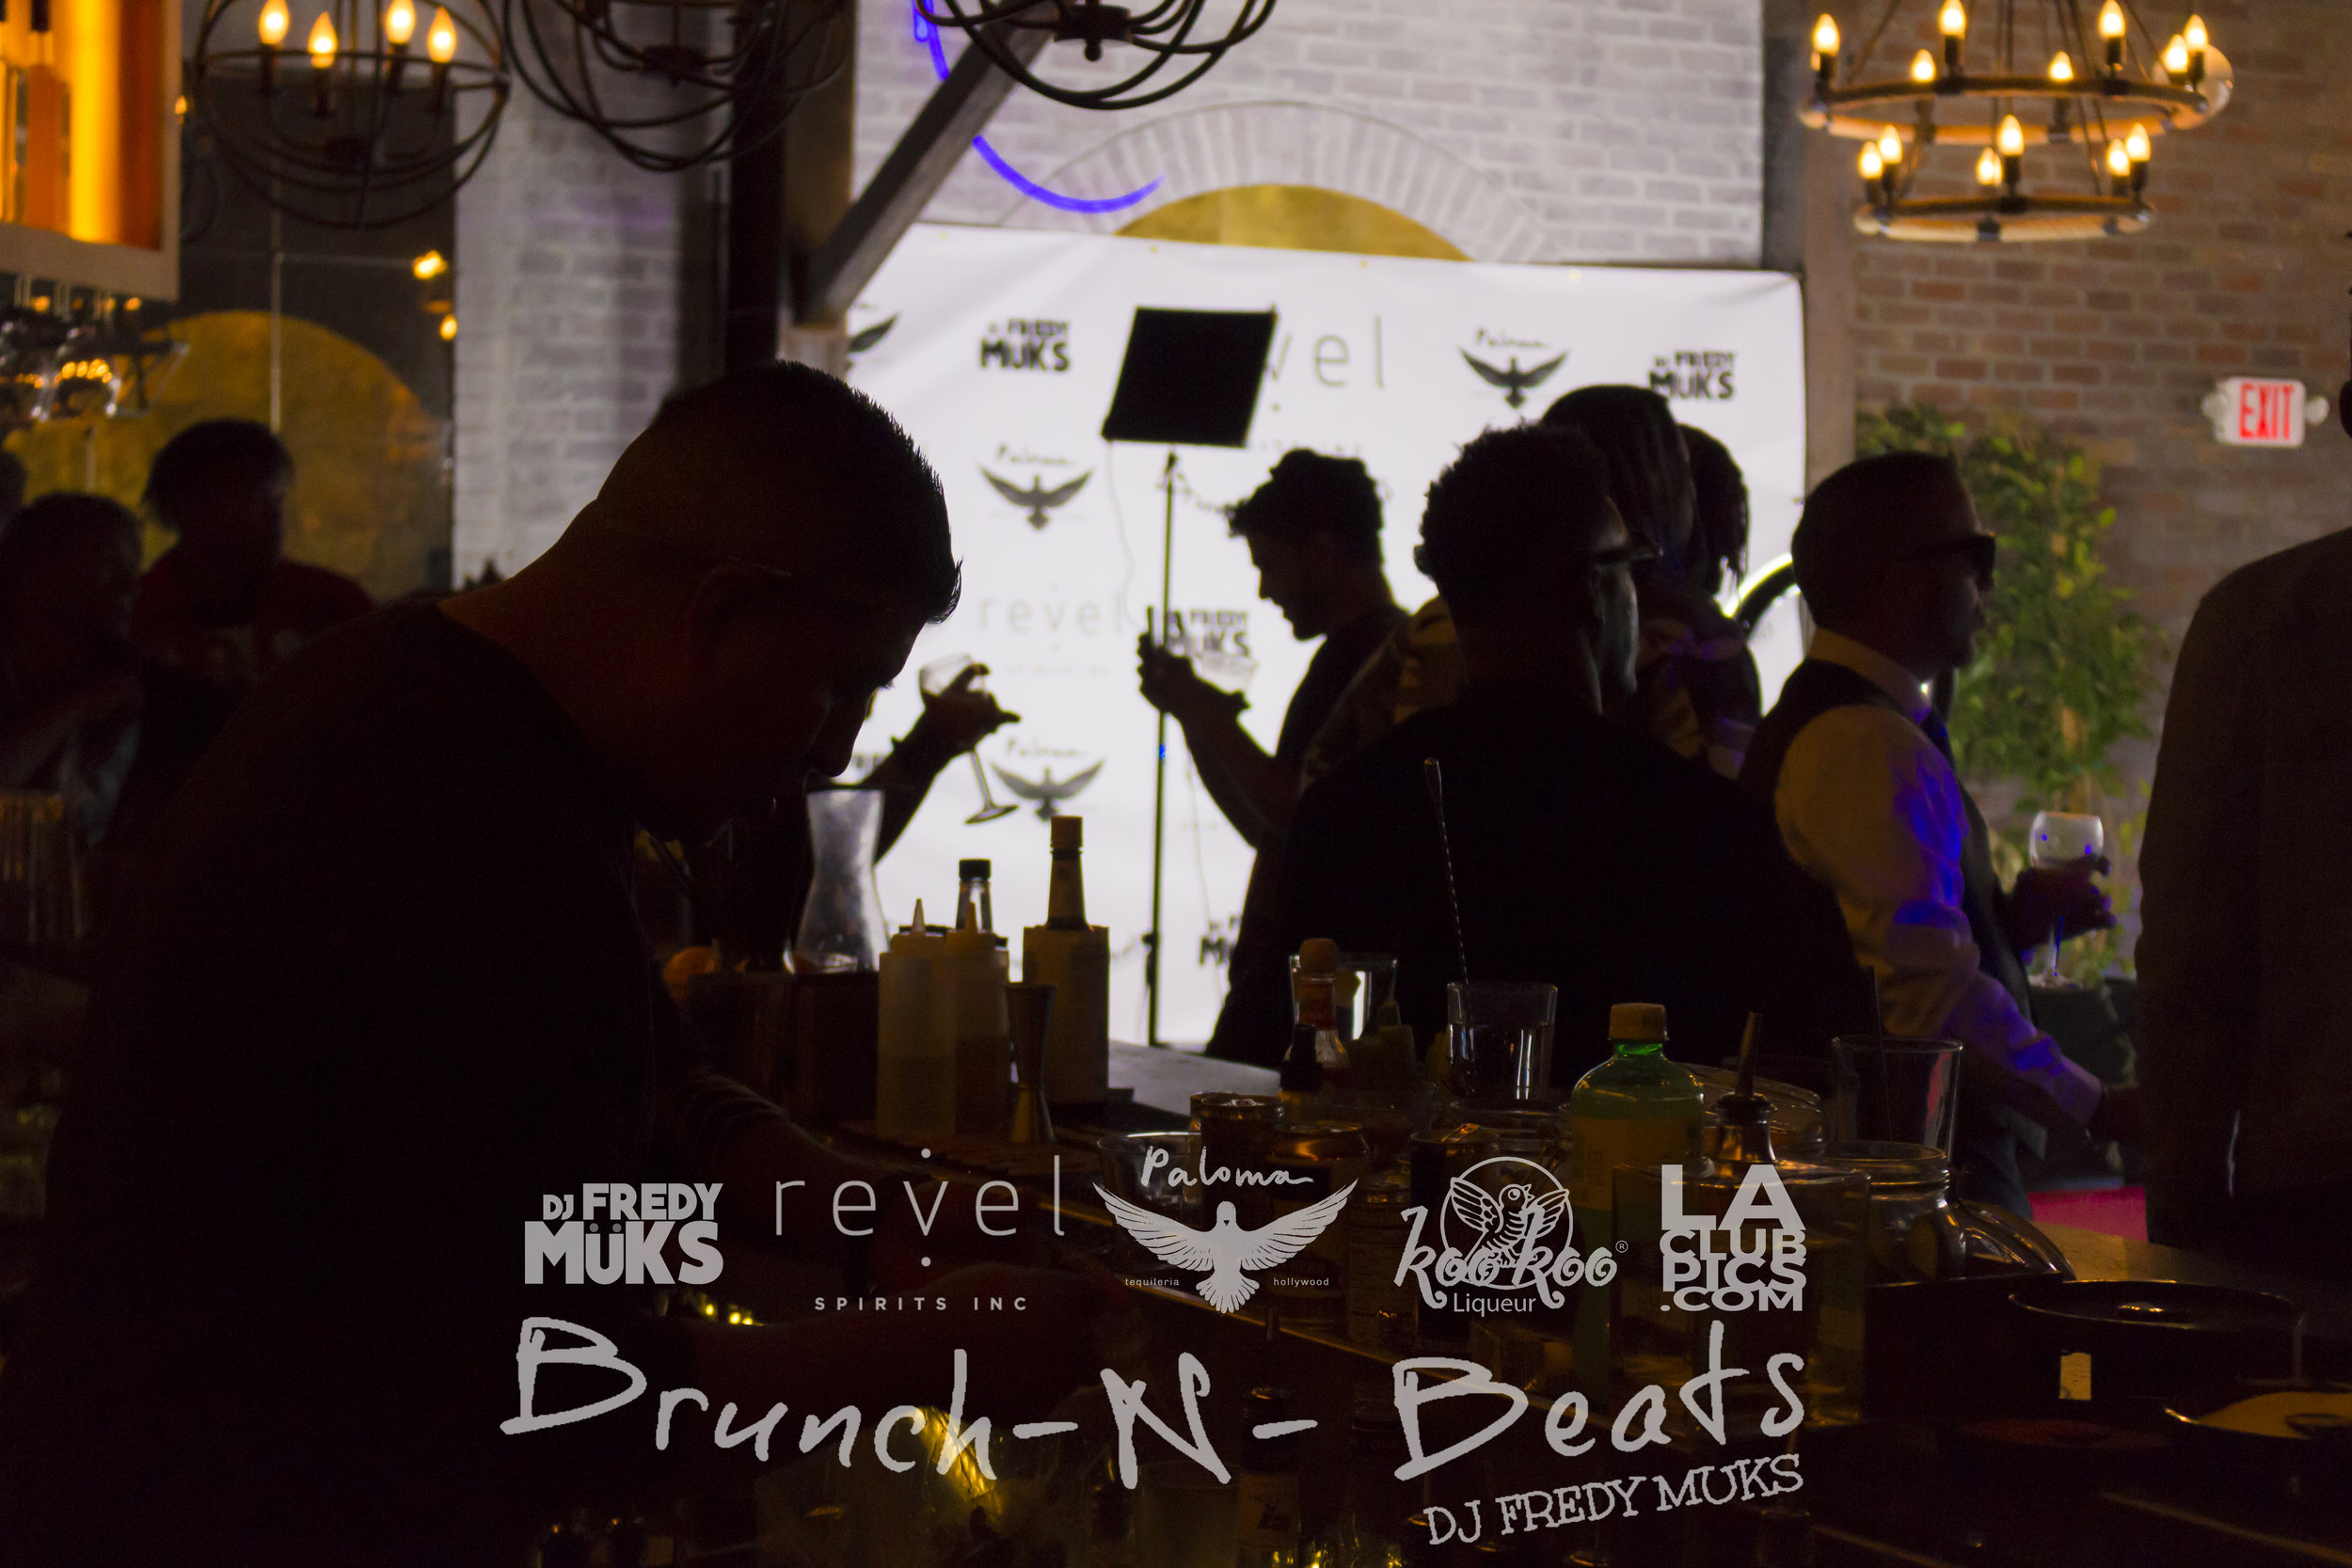 Brunch-N-Beats - Paloma Hollywood - 02-25-18_141.jpg